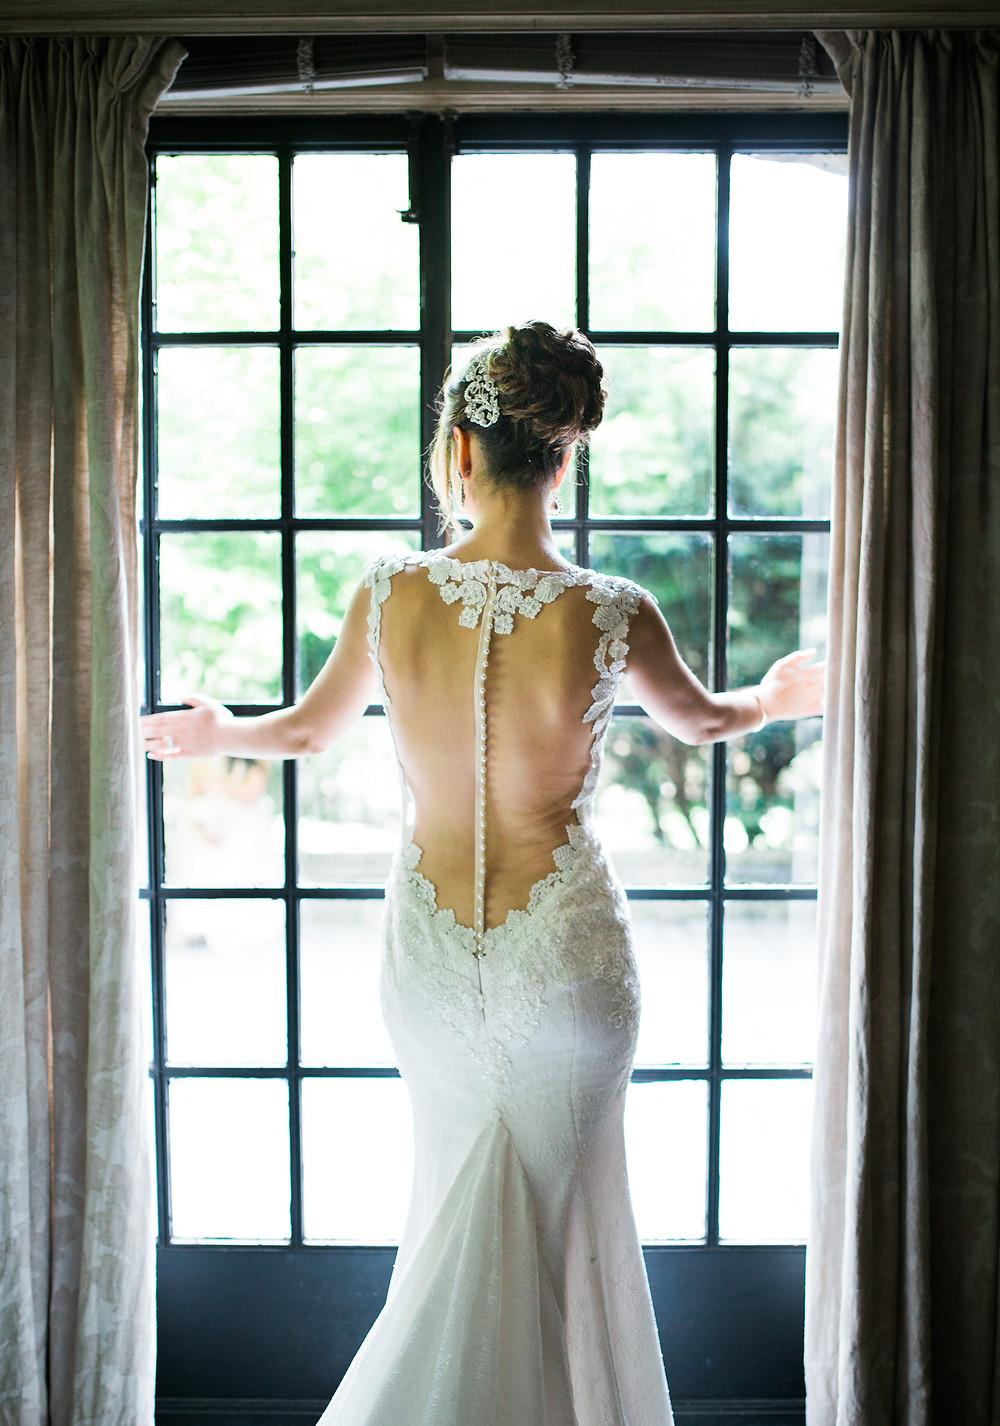 bridal style wedding dress